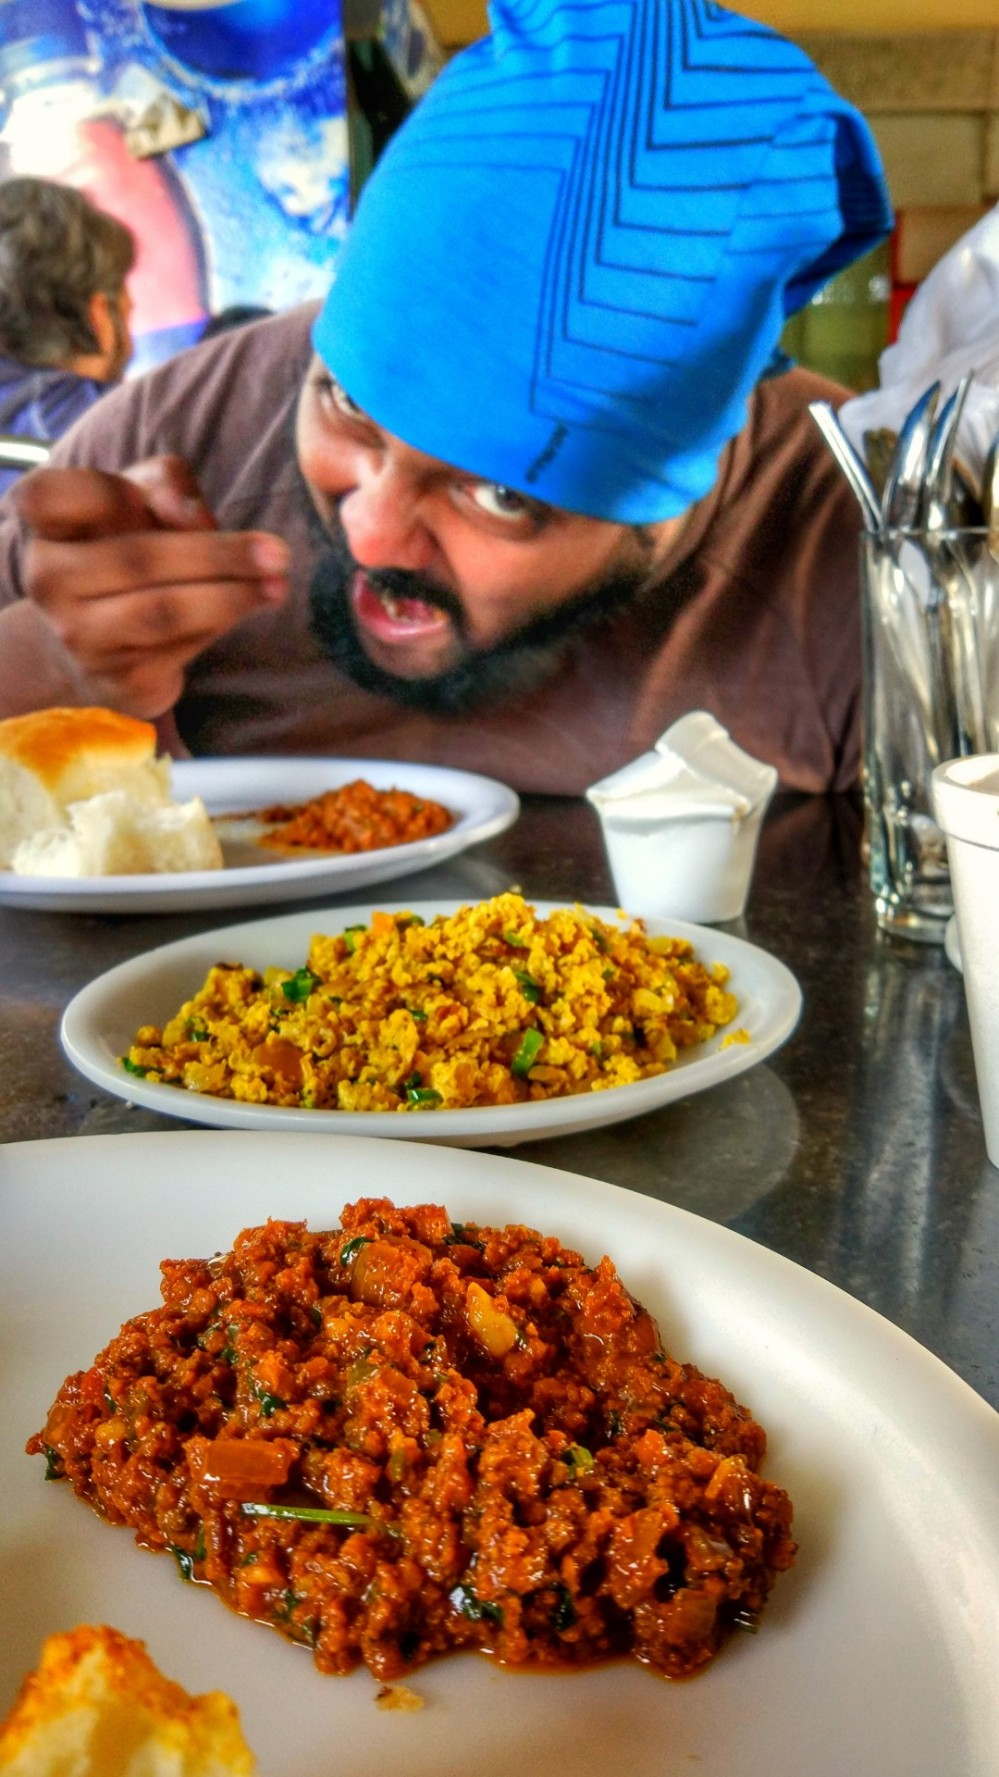 Mutton Kheema & Egg Bhurji at Hotel Ahura